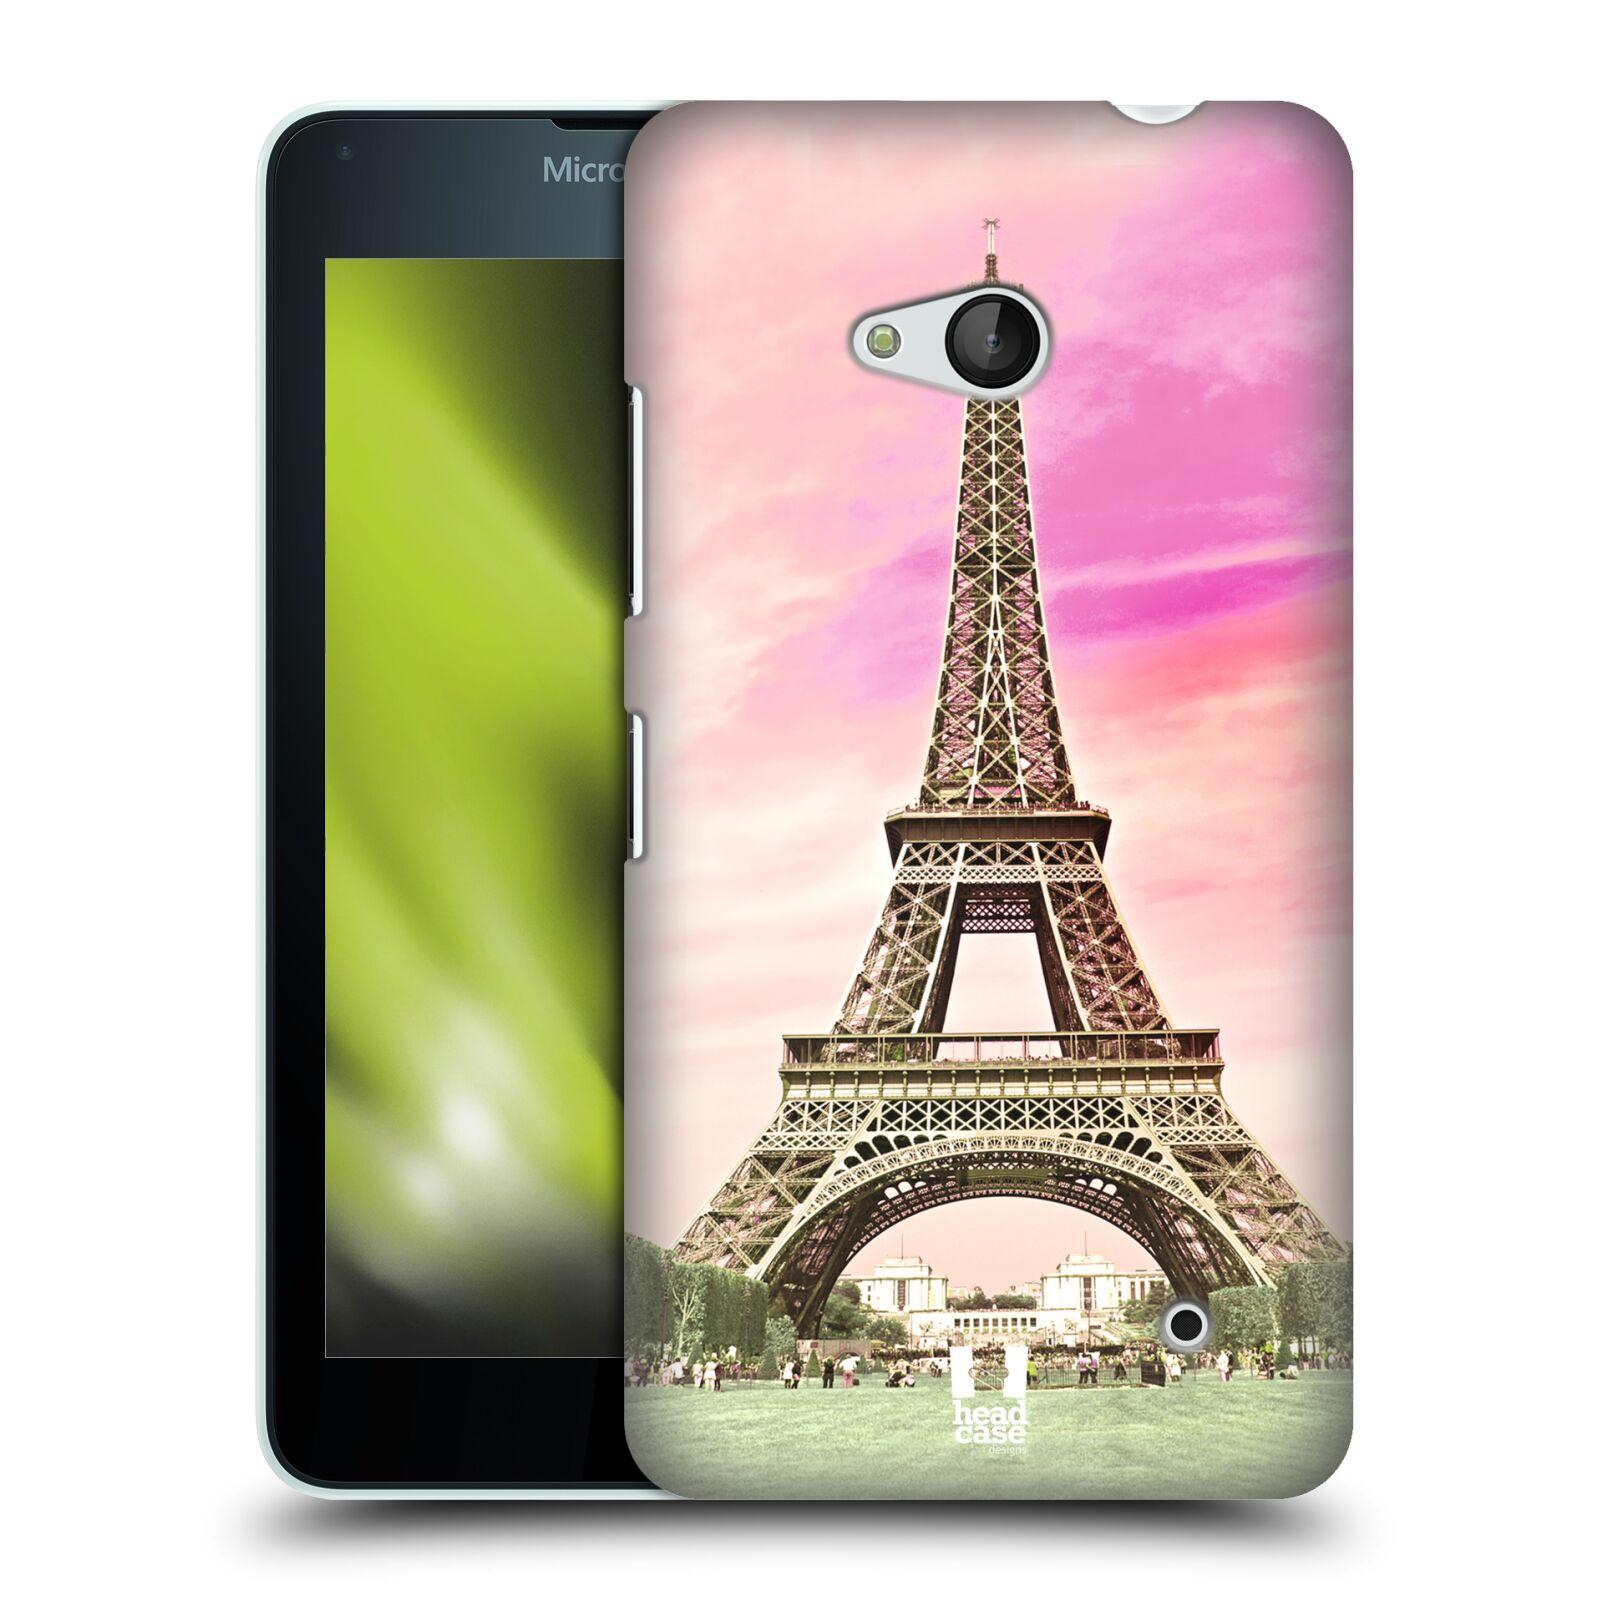 Pouzdro na mobil Microsoft Lumia 640 / 640 DUAL SIM - HEAD CASE - historická místa Eiffelova věž Paříž